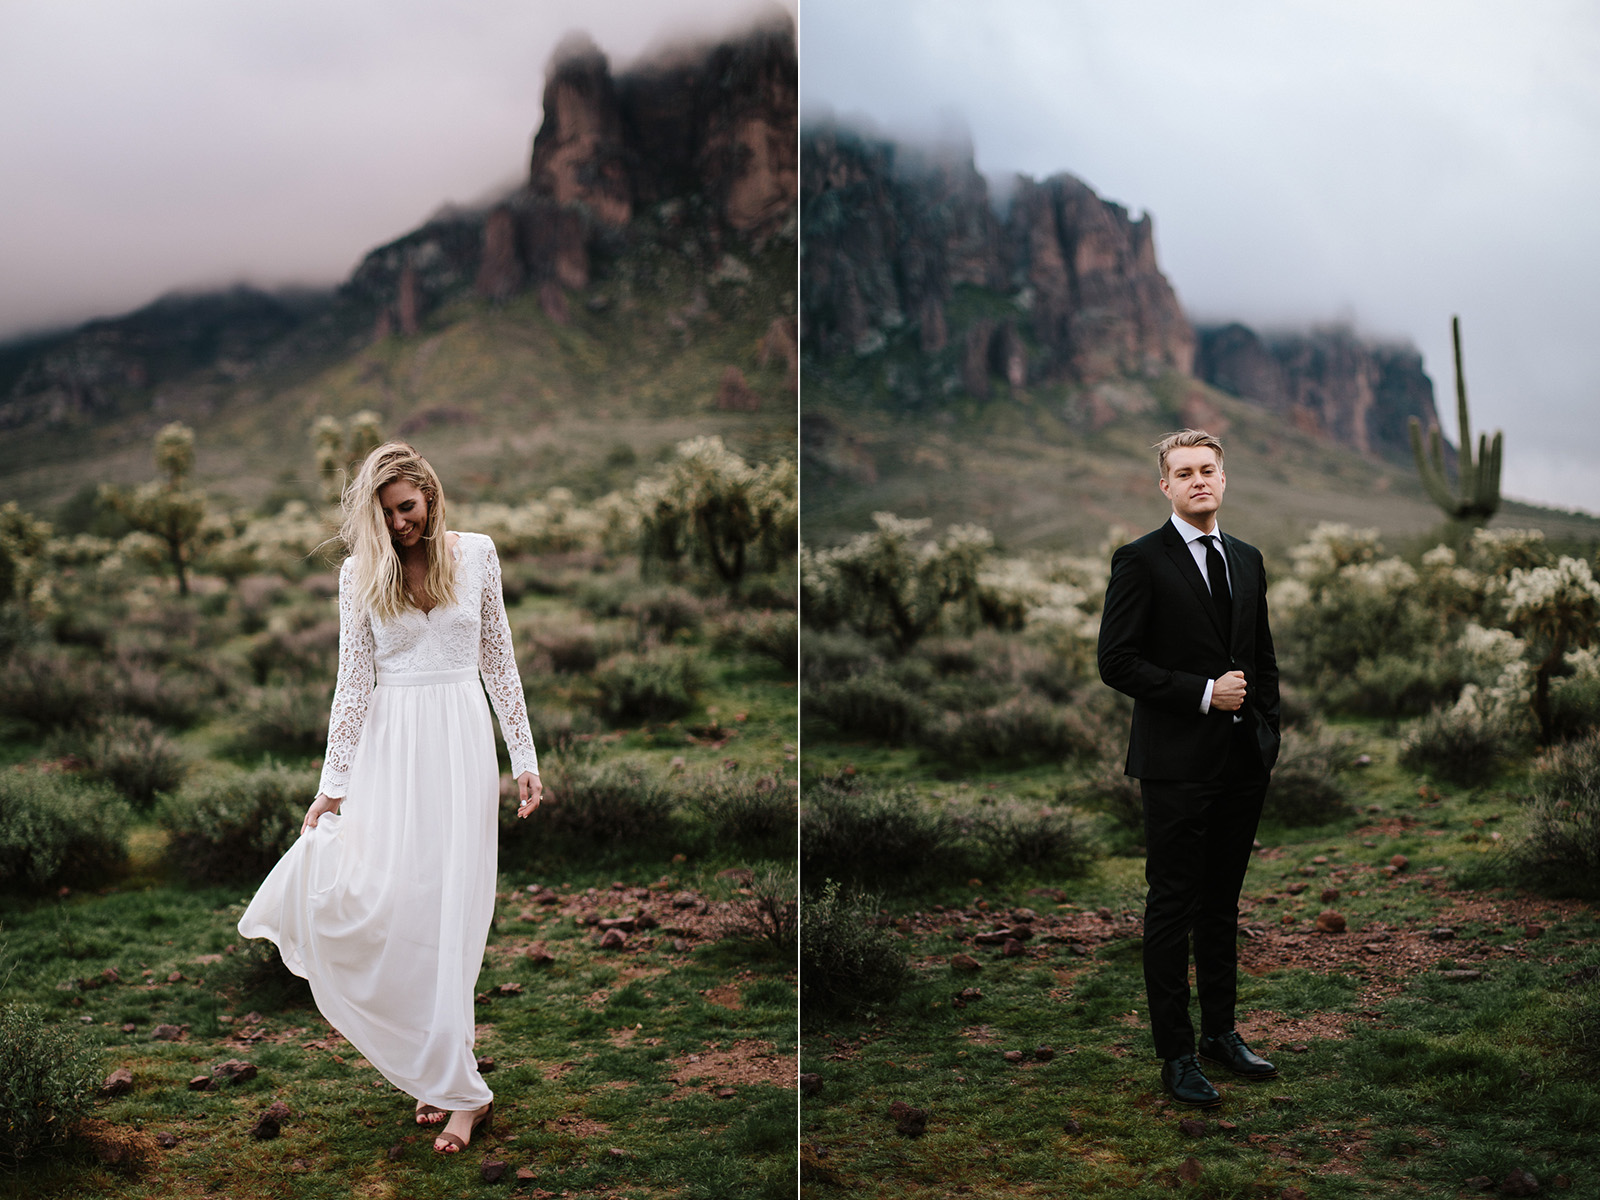 phoenix-mesa-elopement-wedding-photographer-lost-dutchman-state-park-superstitious-mountains-31.jpg